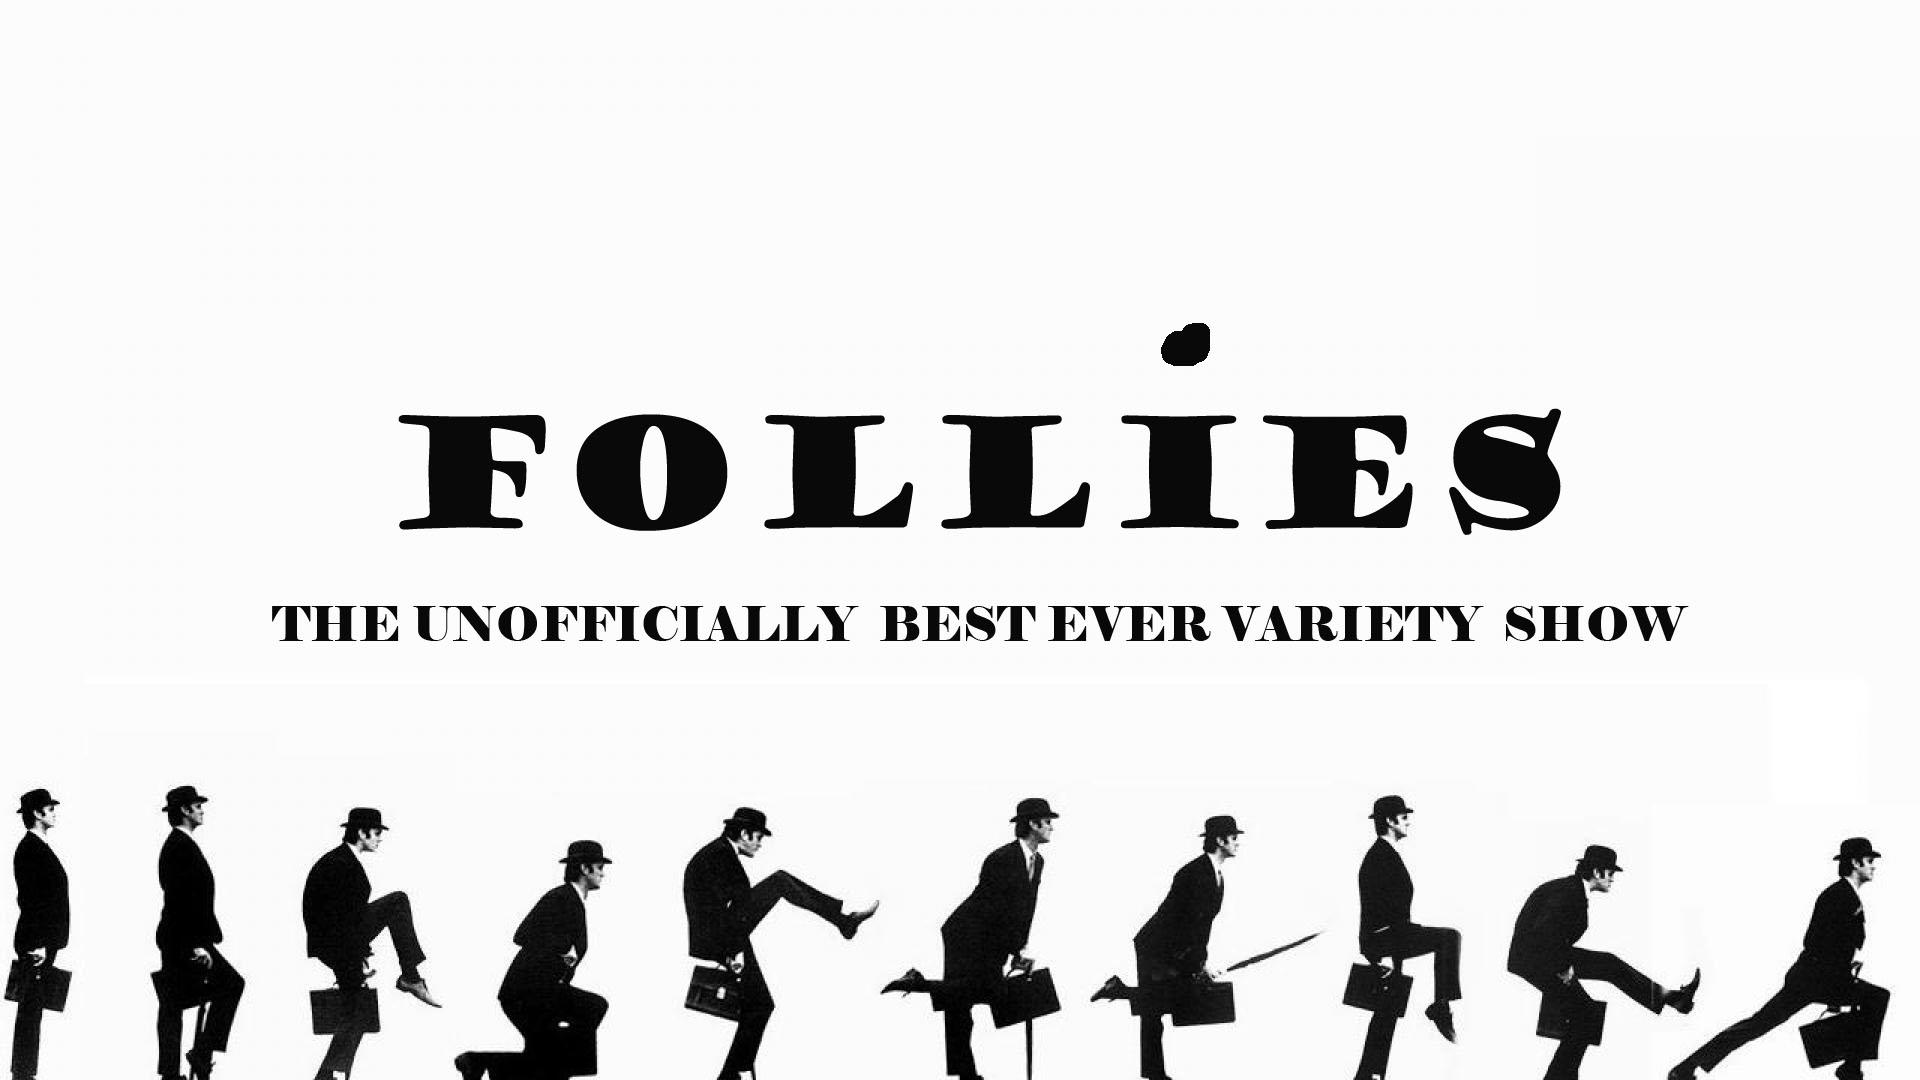 Follies